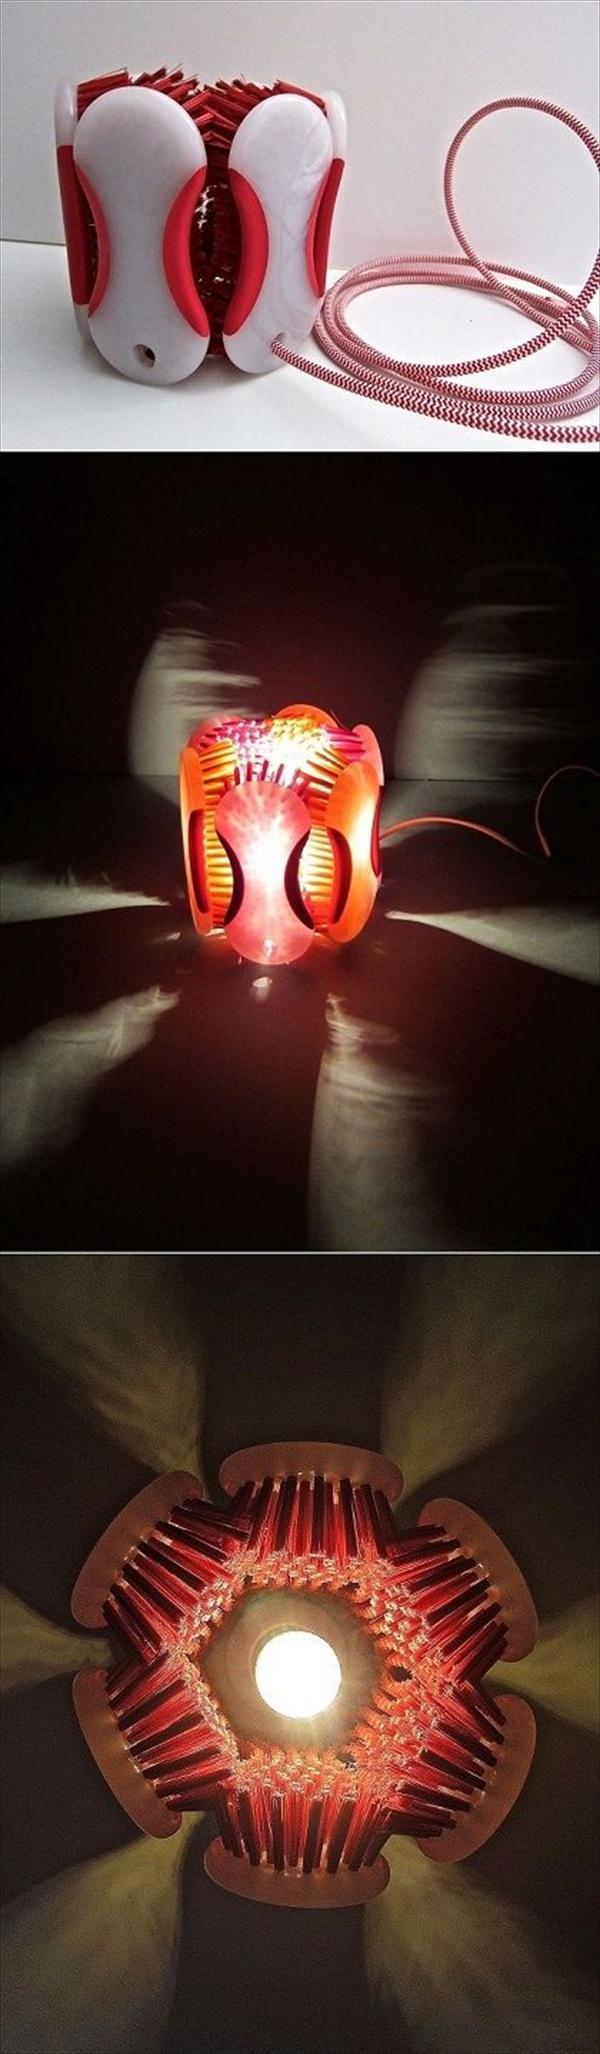 diy lamp 11 15 creative DIY lamp ideas you can make under your budget